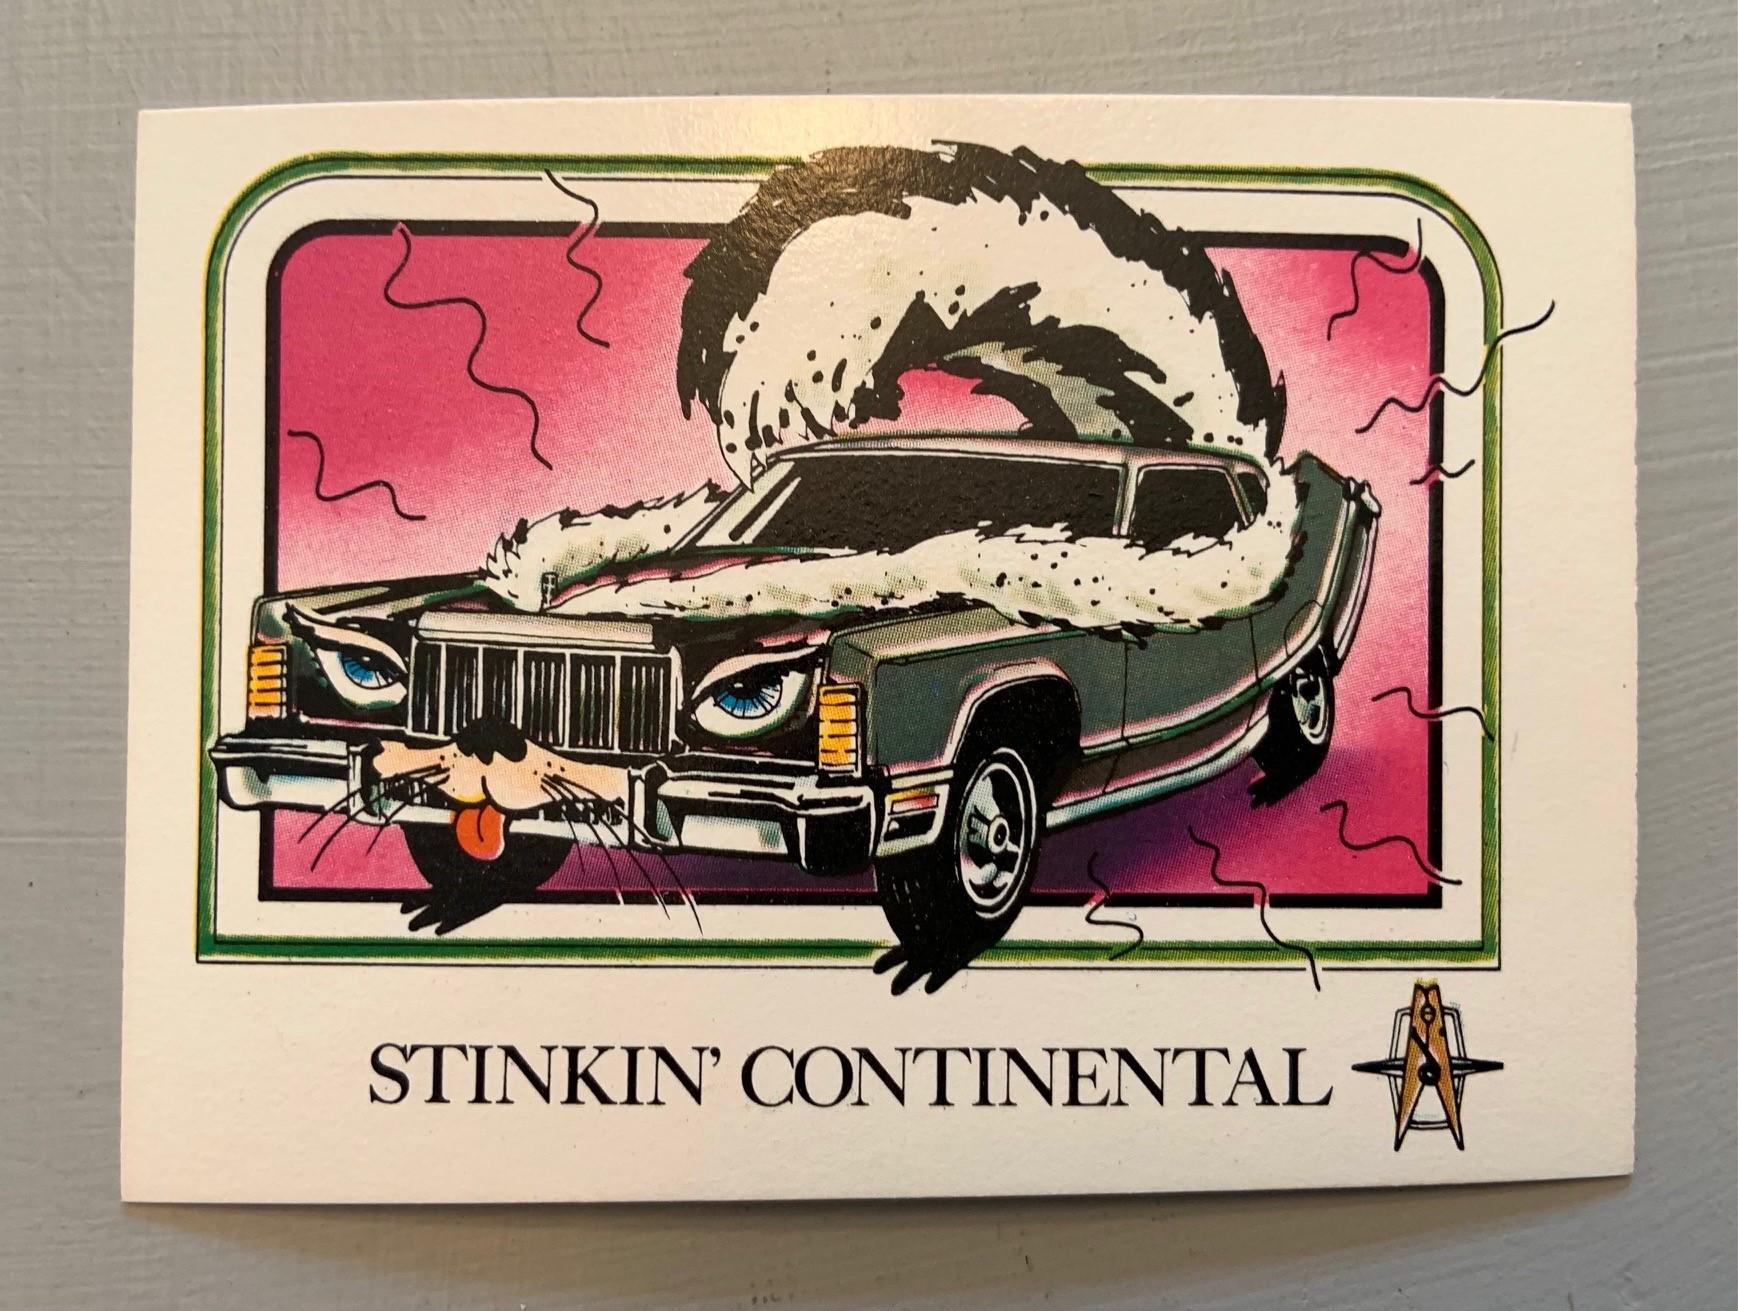 1976 Wonder Bread Krazy Cars - Stinkin Continental